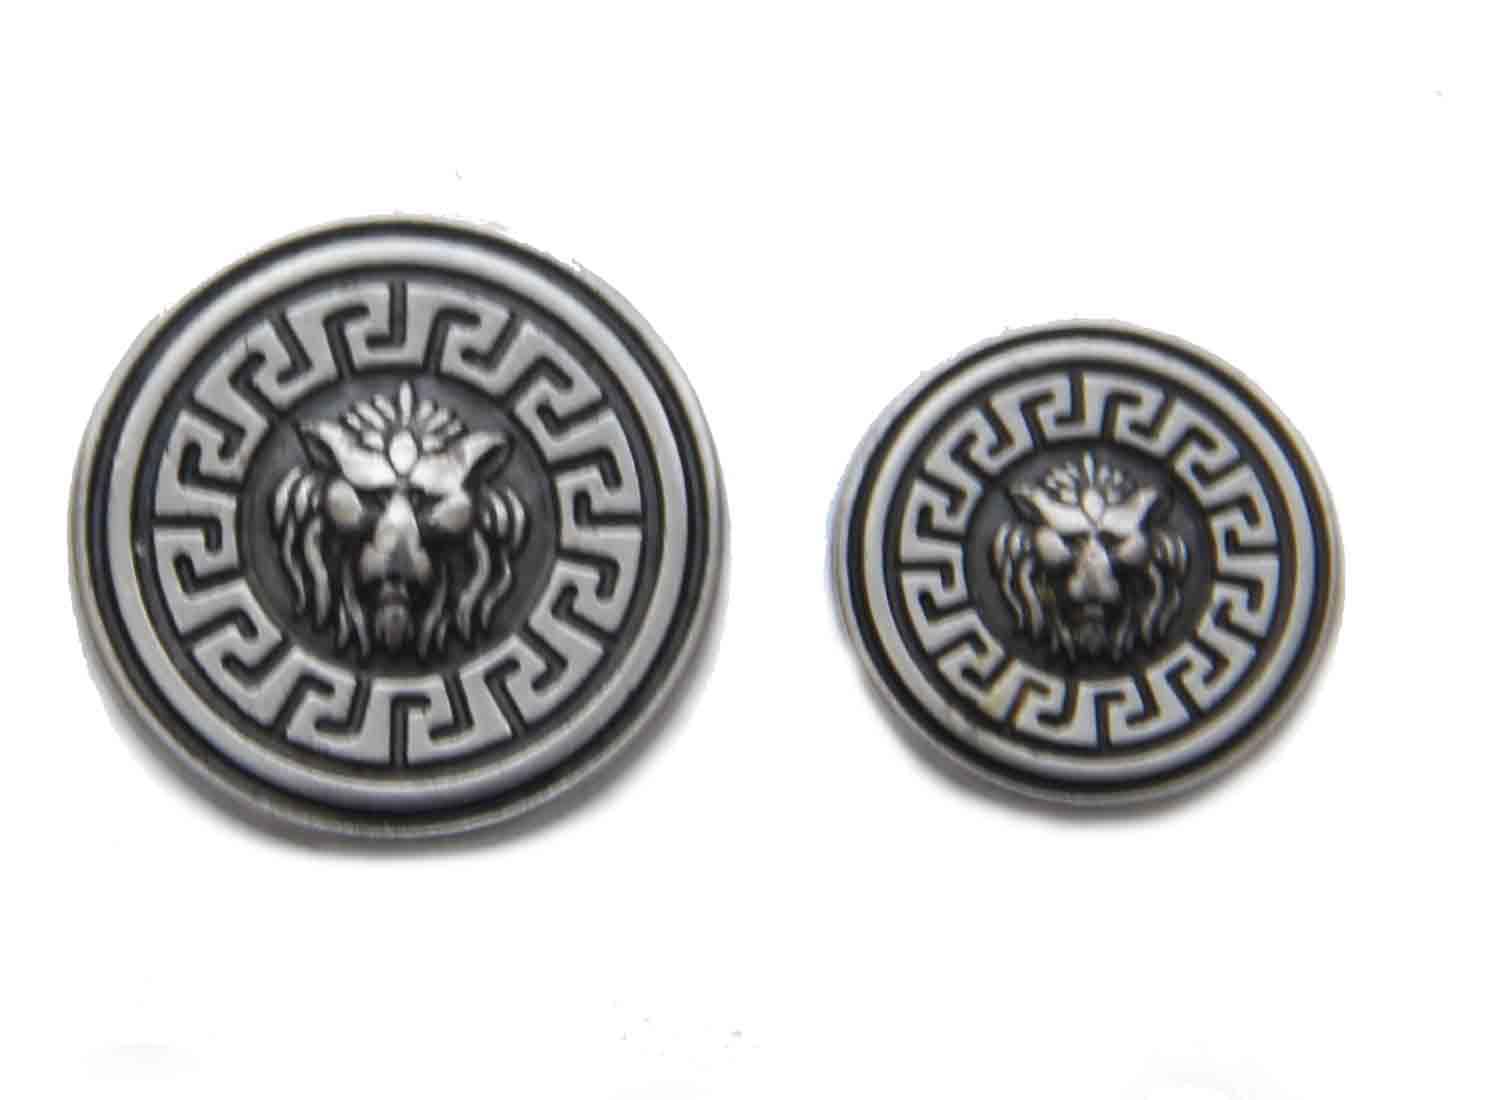 Vintage Dolce & Gabbana Blazer Jacket Replacement Spare Buttons Gray Silver Lion Pattern Men's